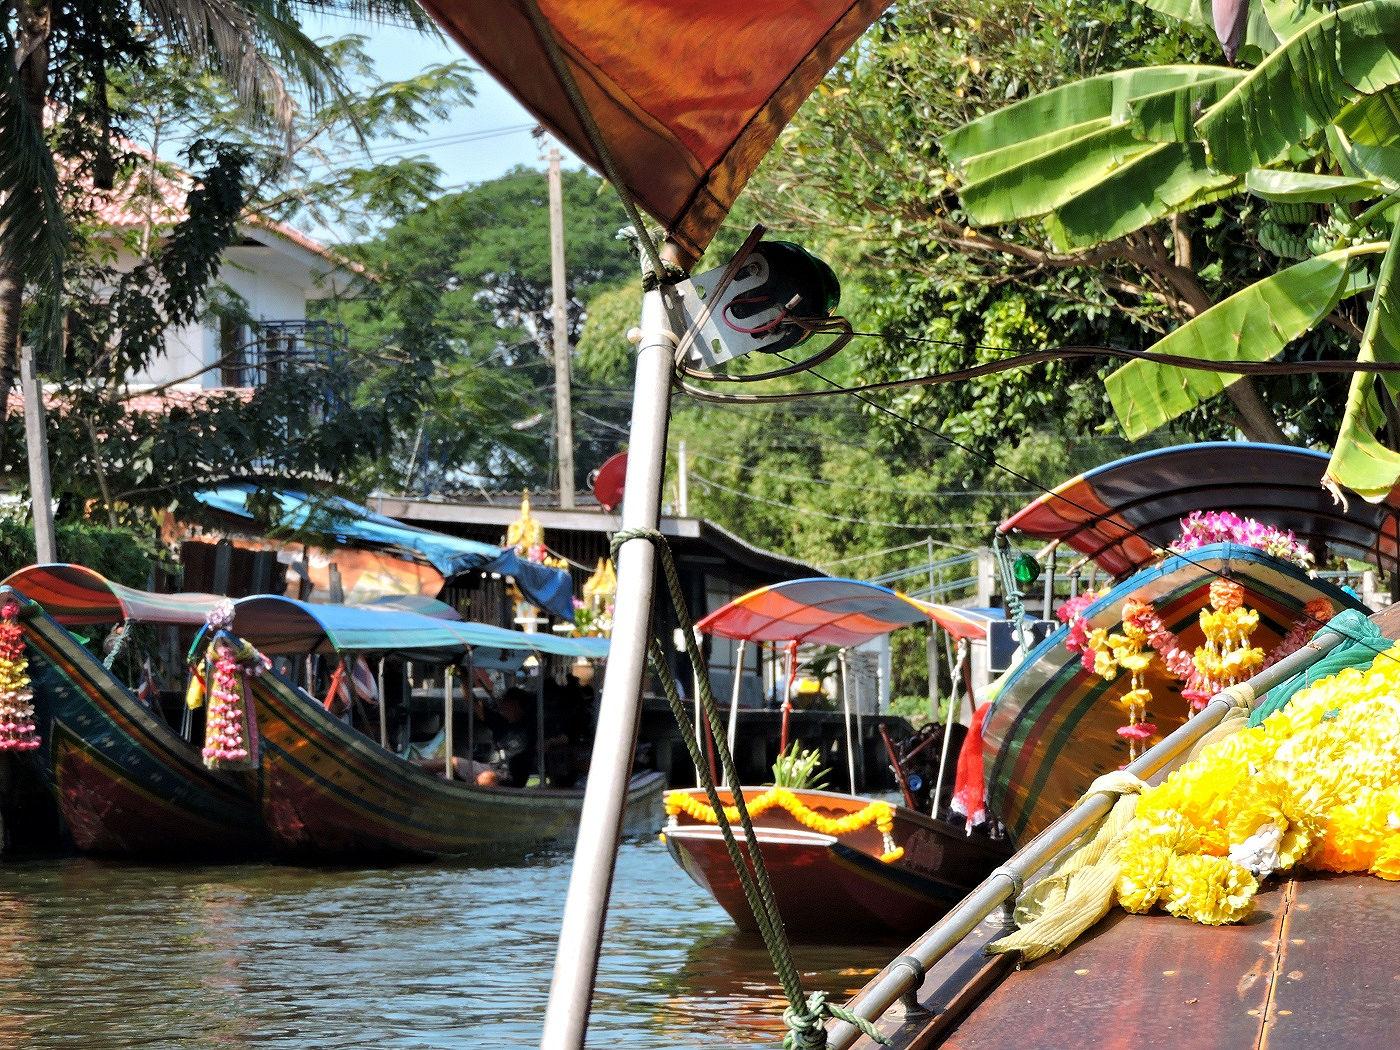 boats touring thonburi bangkok khlongs